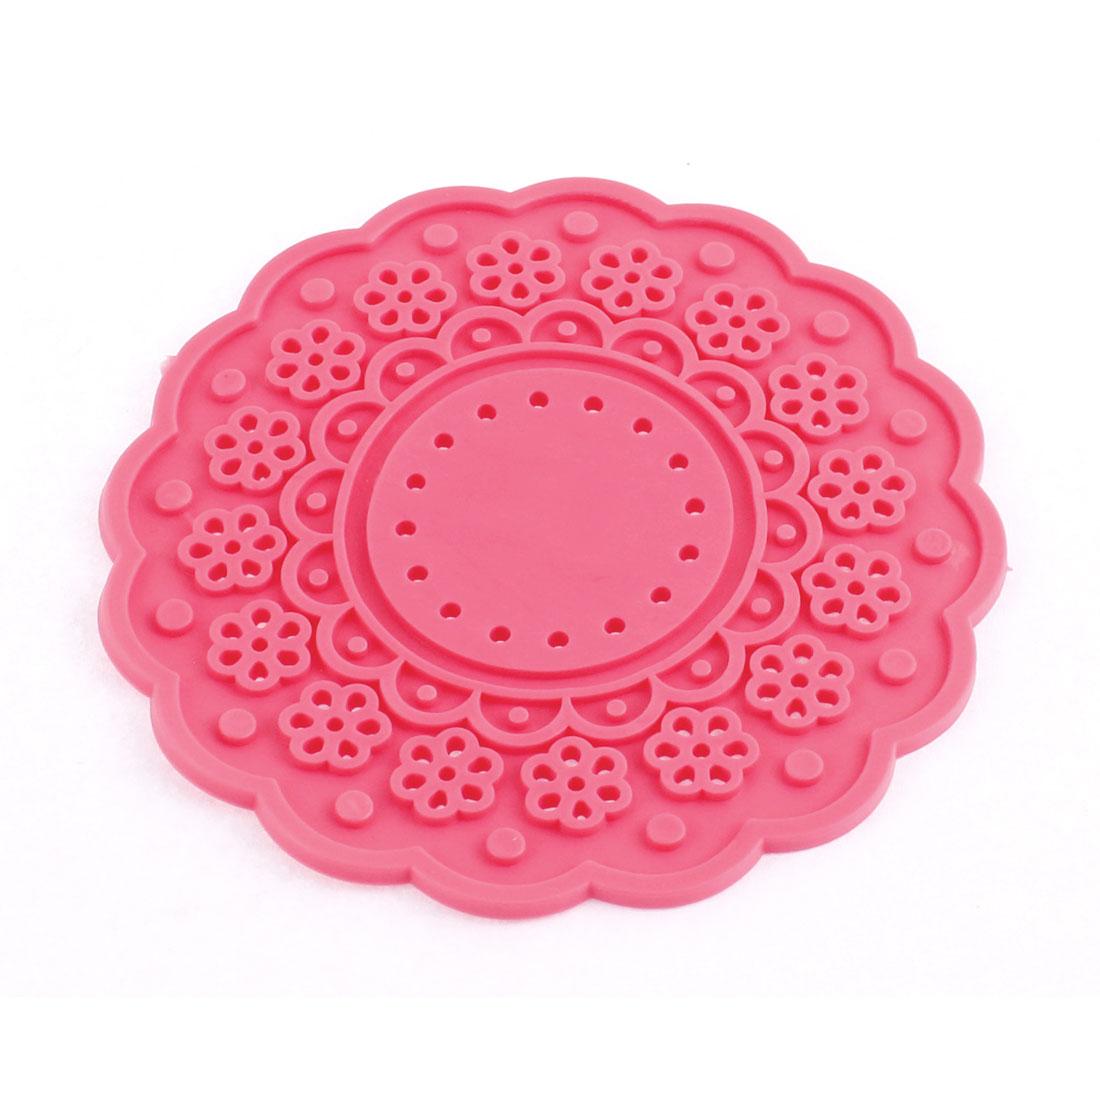 Fuschia Silicone Lace Doily Coasters Drink Tea Cup Mat 10cm Dia